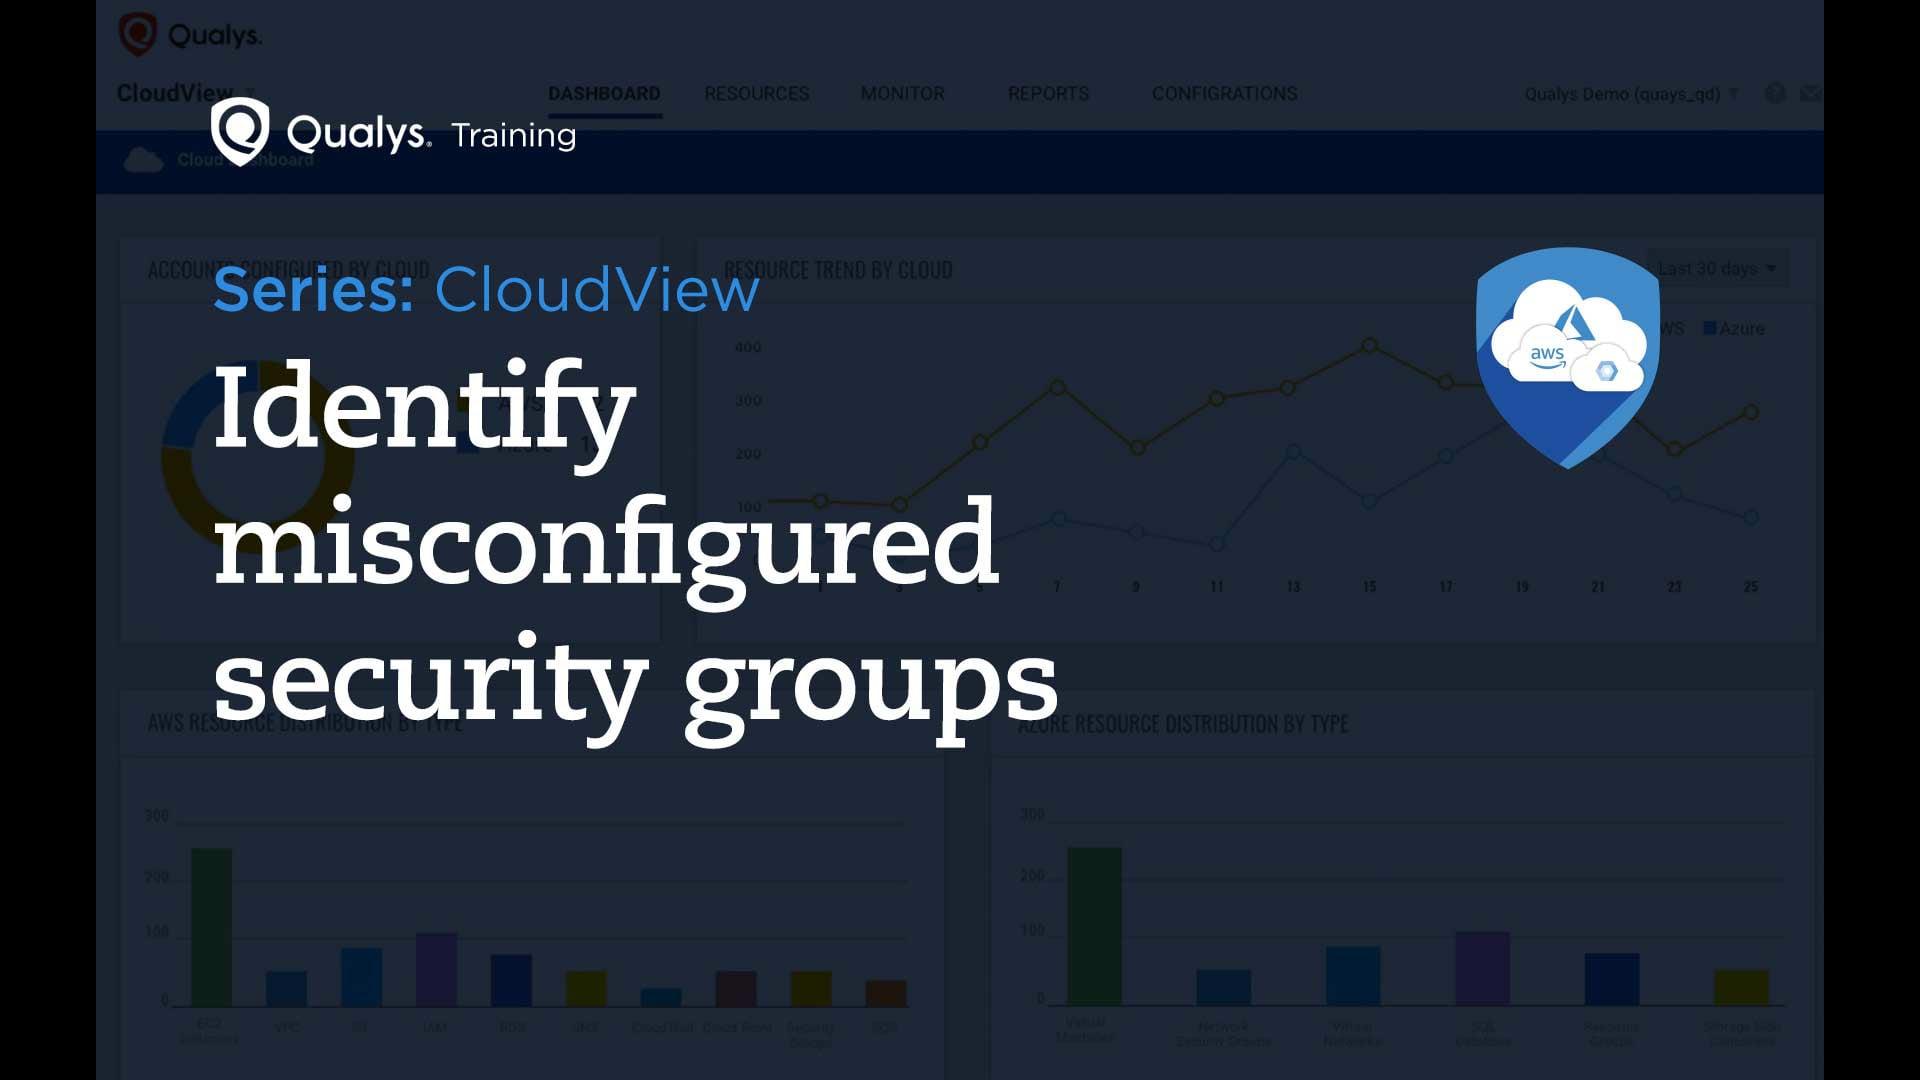 Identify misconfigured security groups